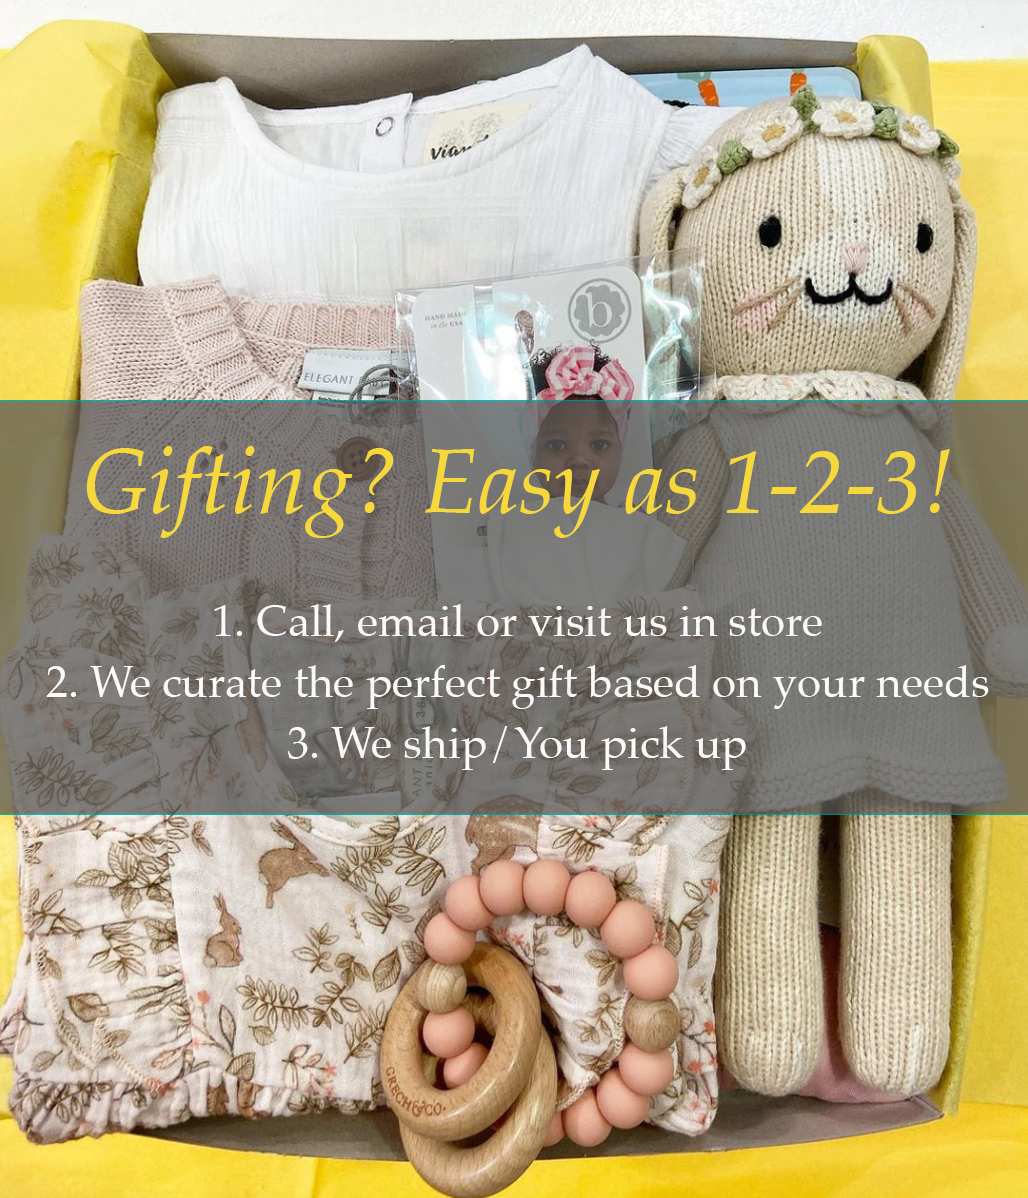 Gift Giving. Made easy.